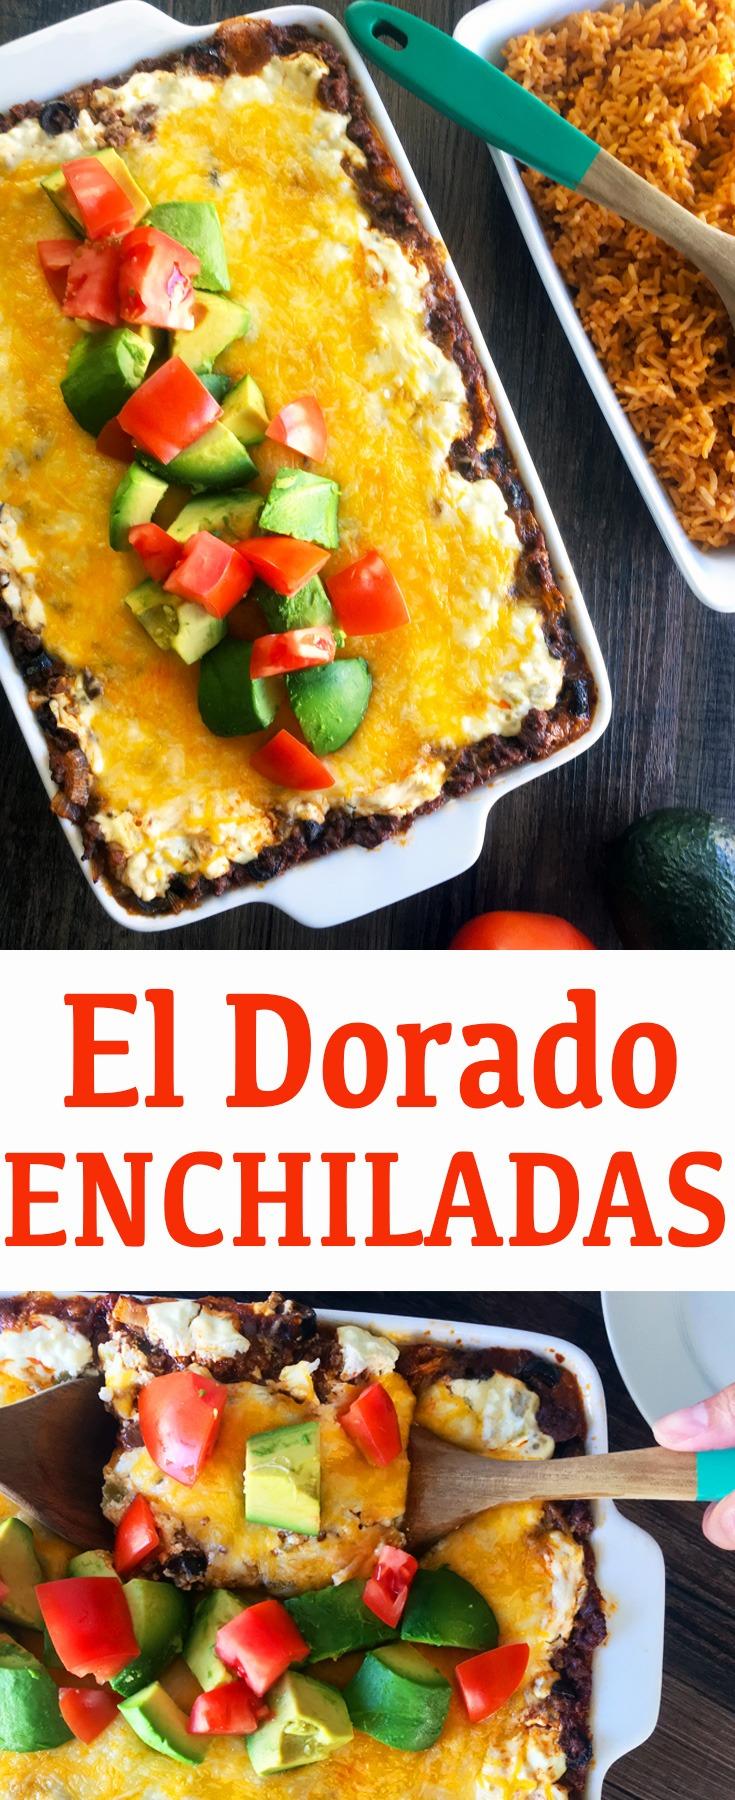 El Dorado Enchilada Casserole